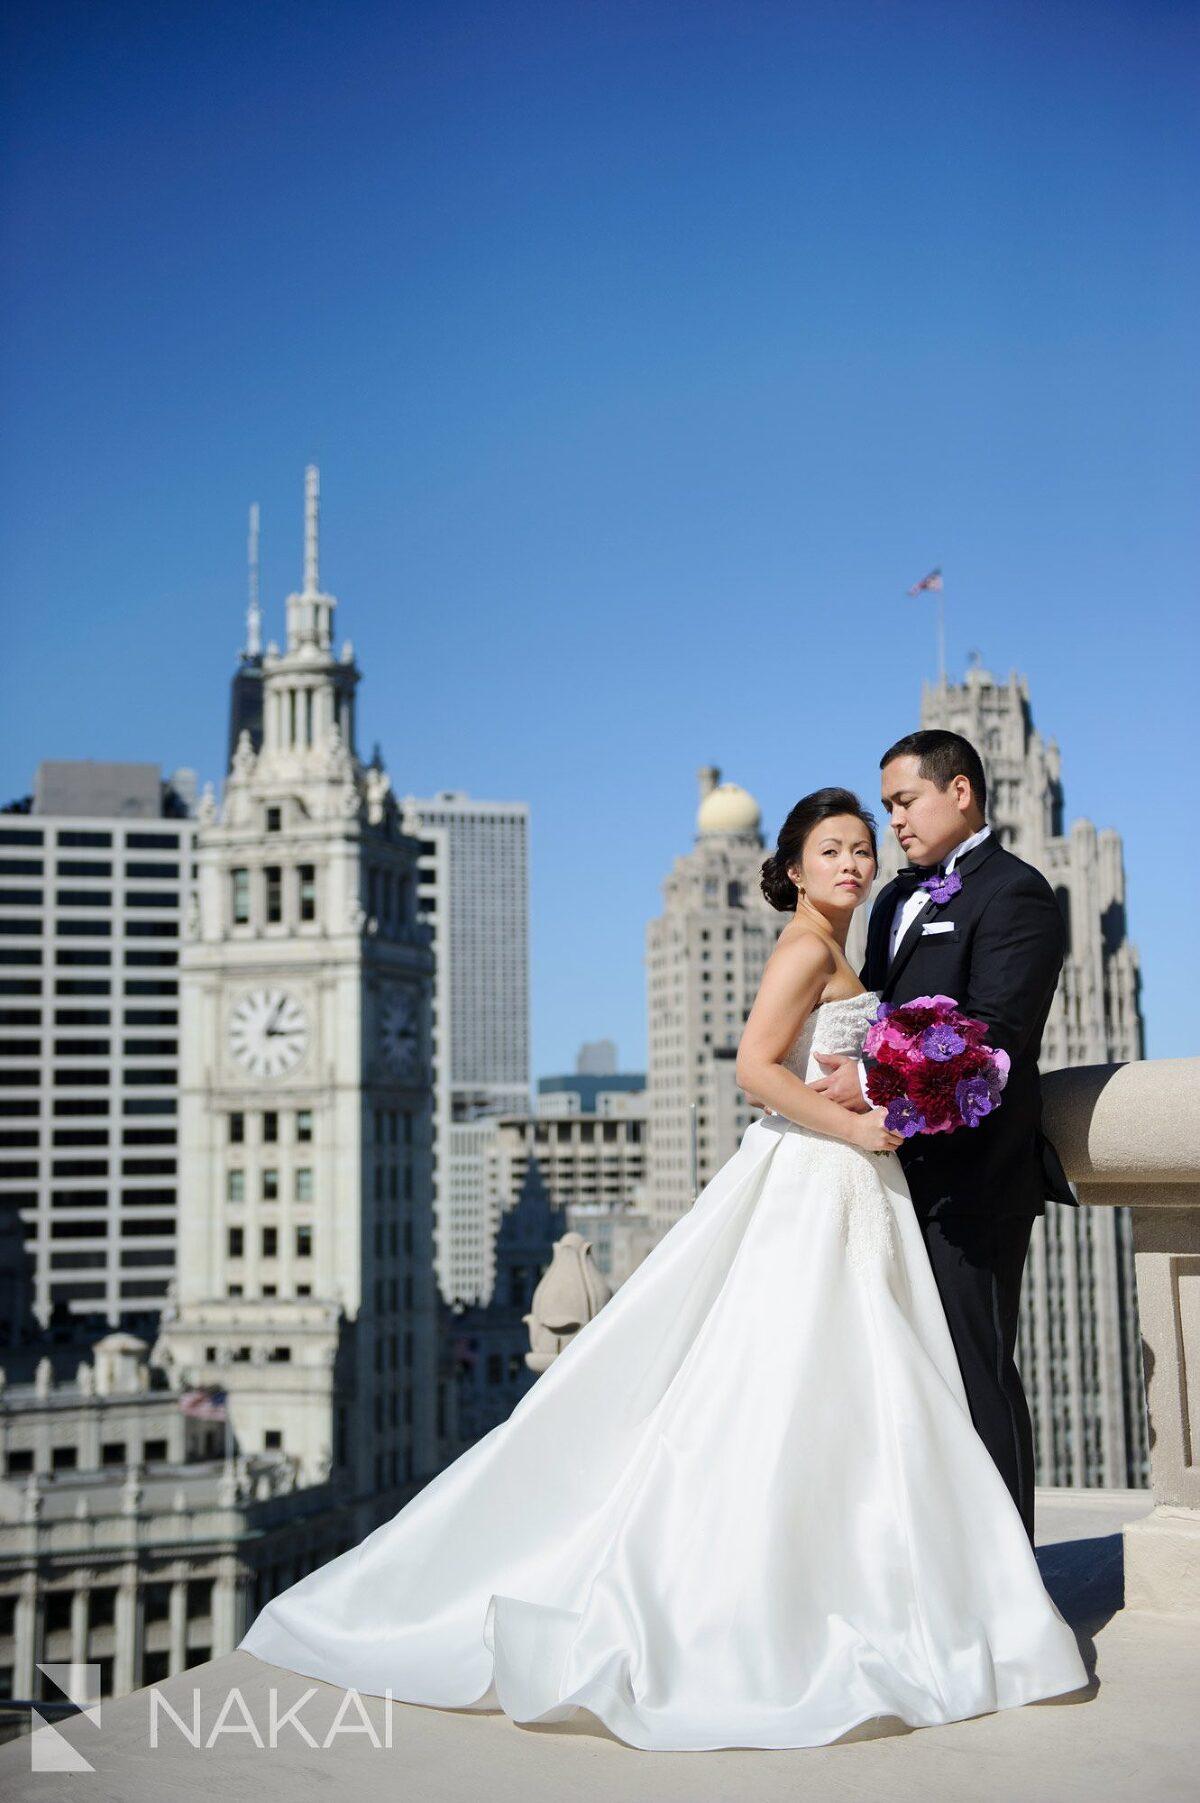 London House Chicago Wedding Photos! Riverwalk + Field Museum ...